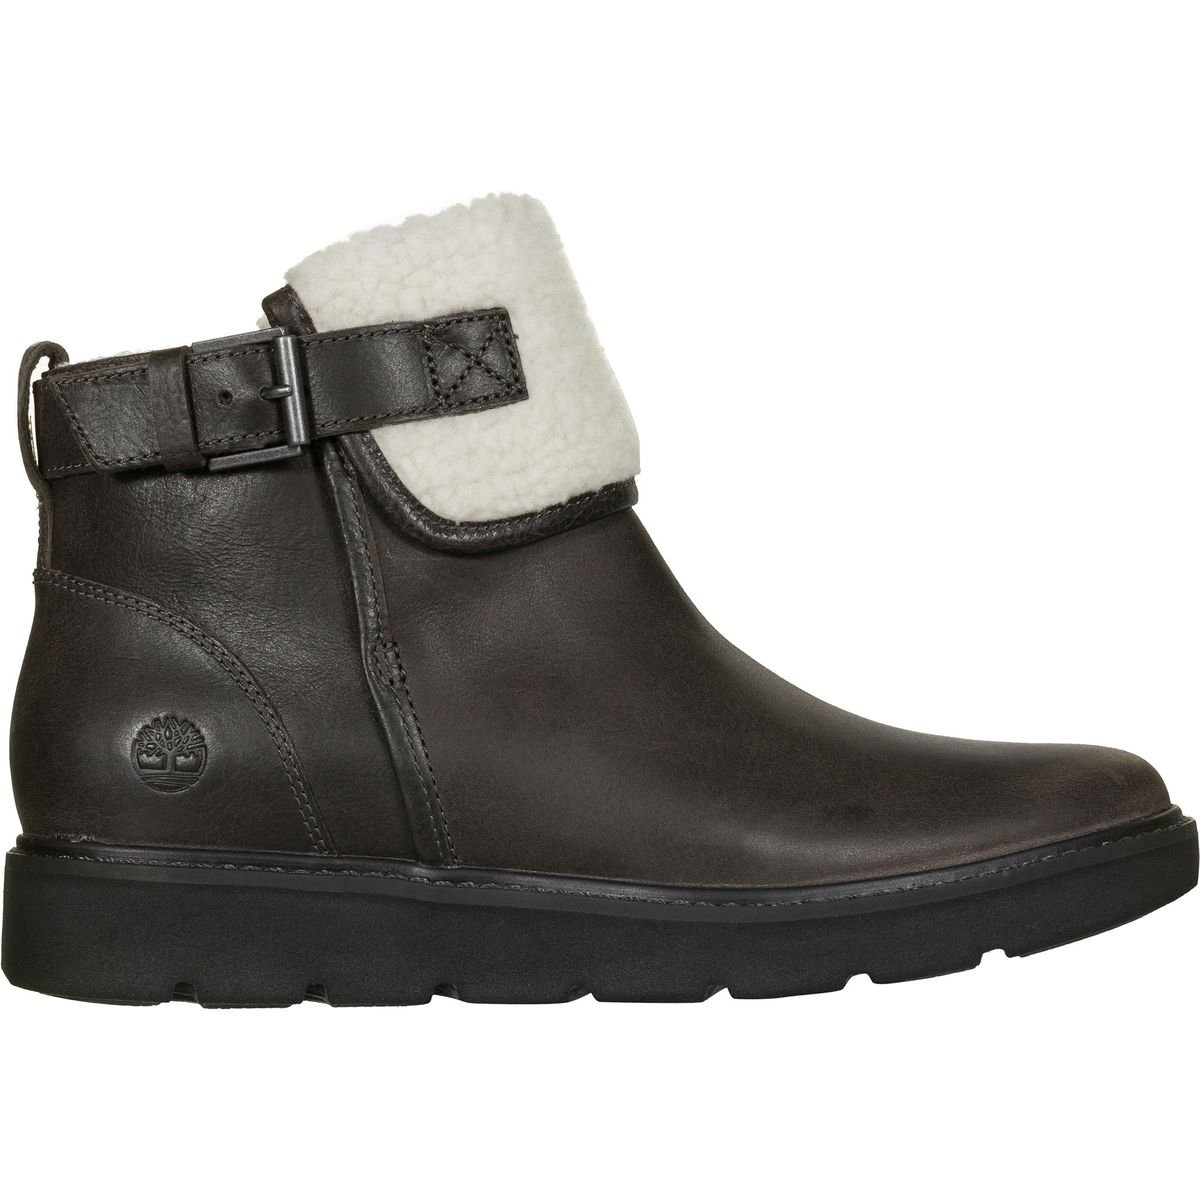 Timberland Women's Kenniston Fleece Lined Boot Dark Grey Full-Grain 9.5 B US